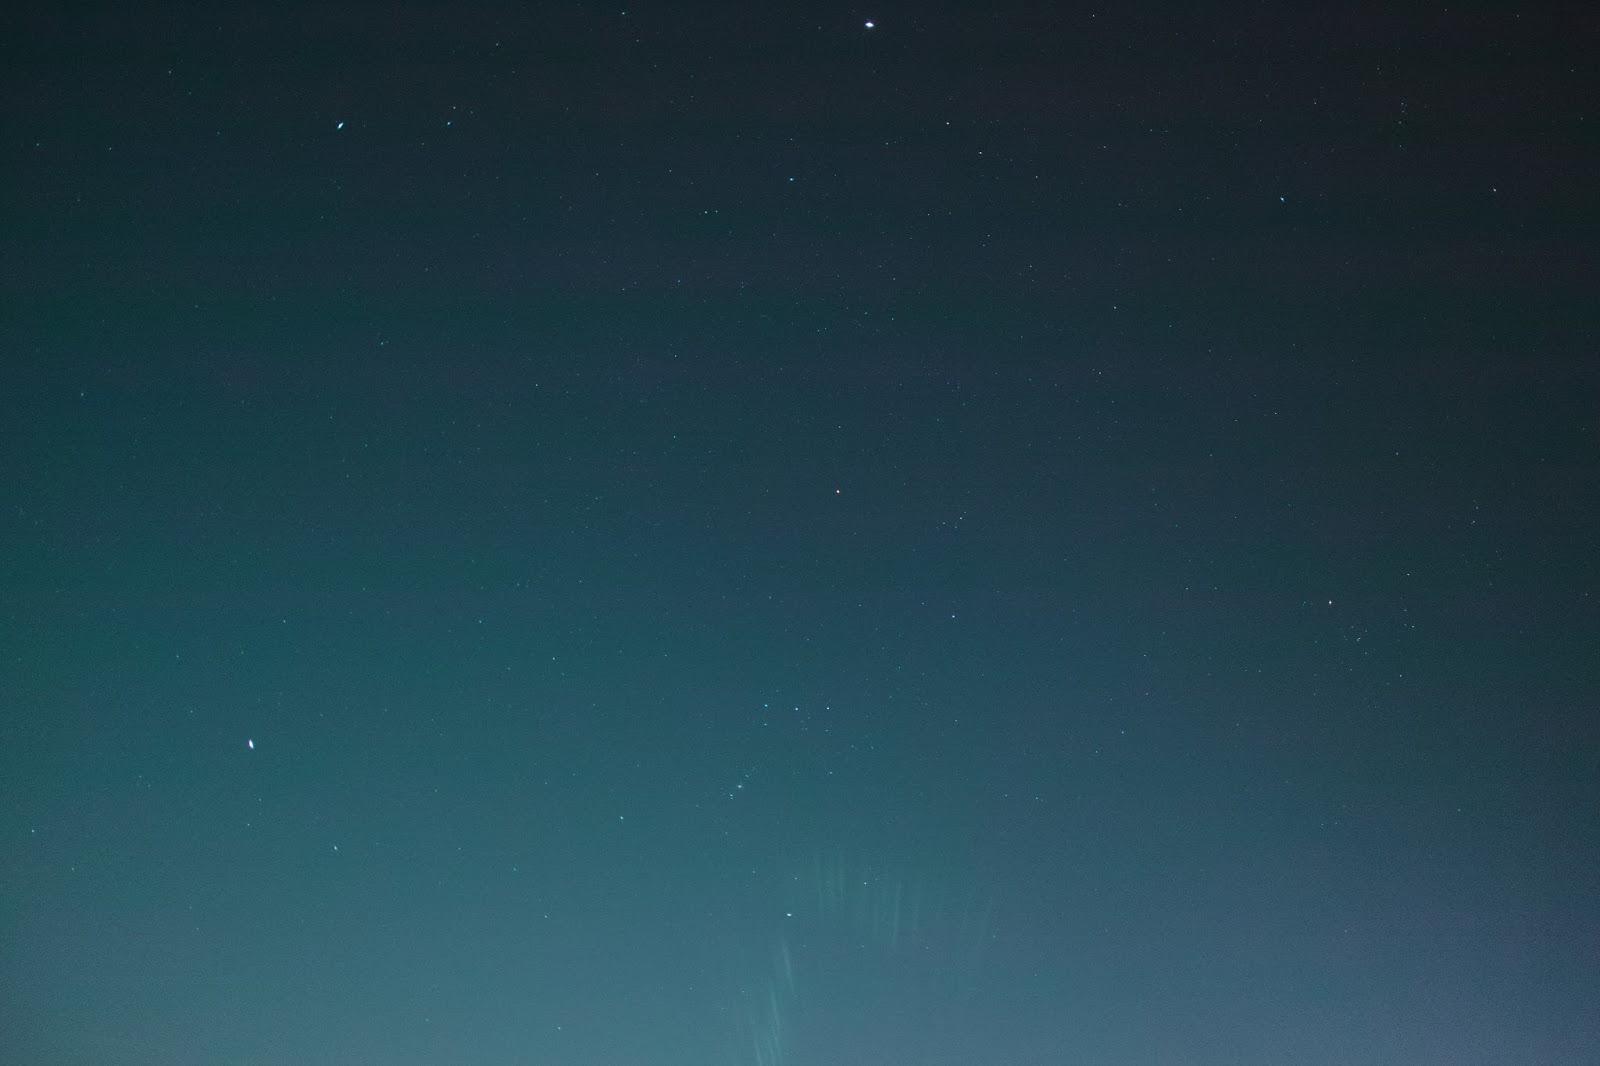 DP1Merrill 星